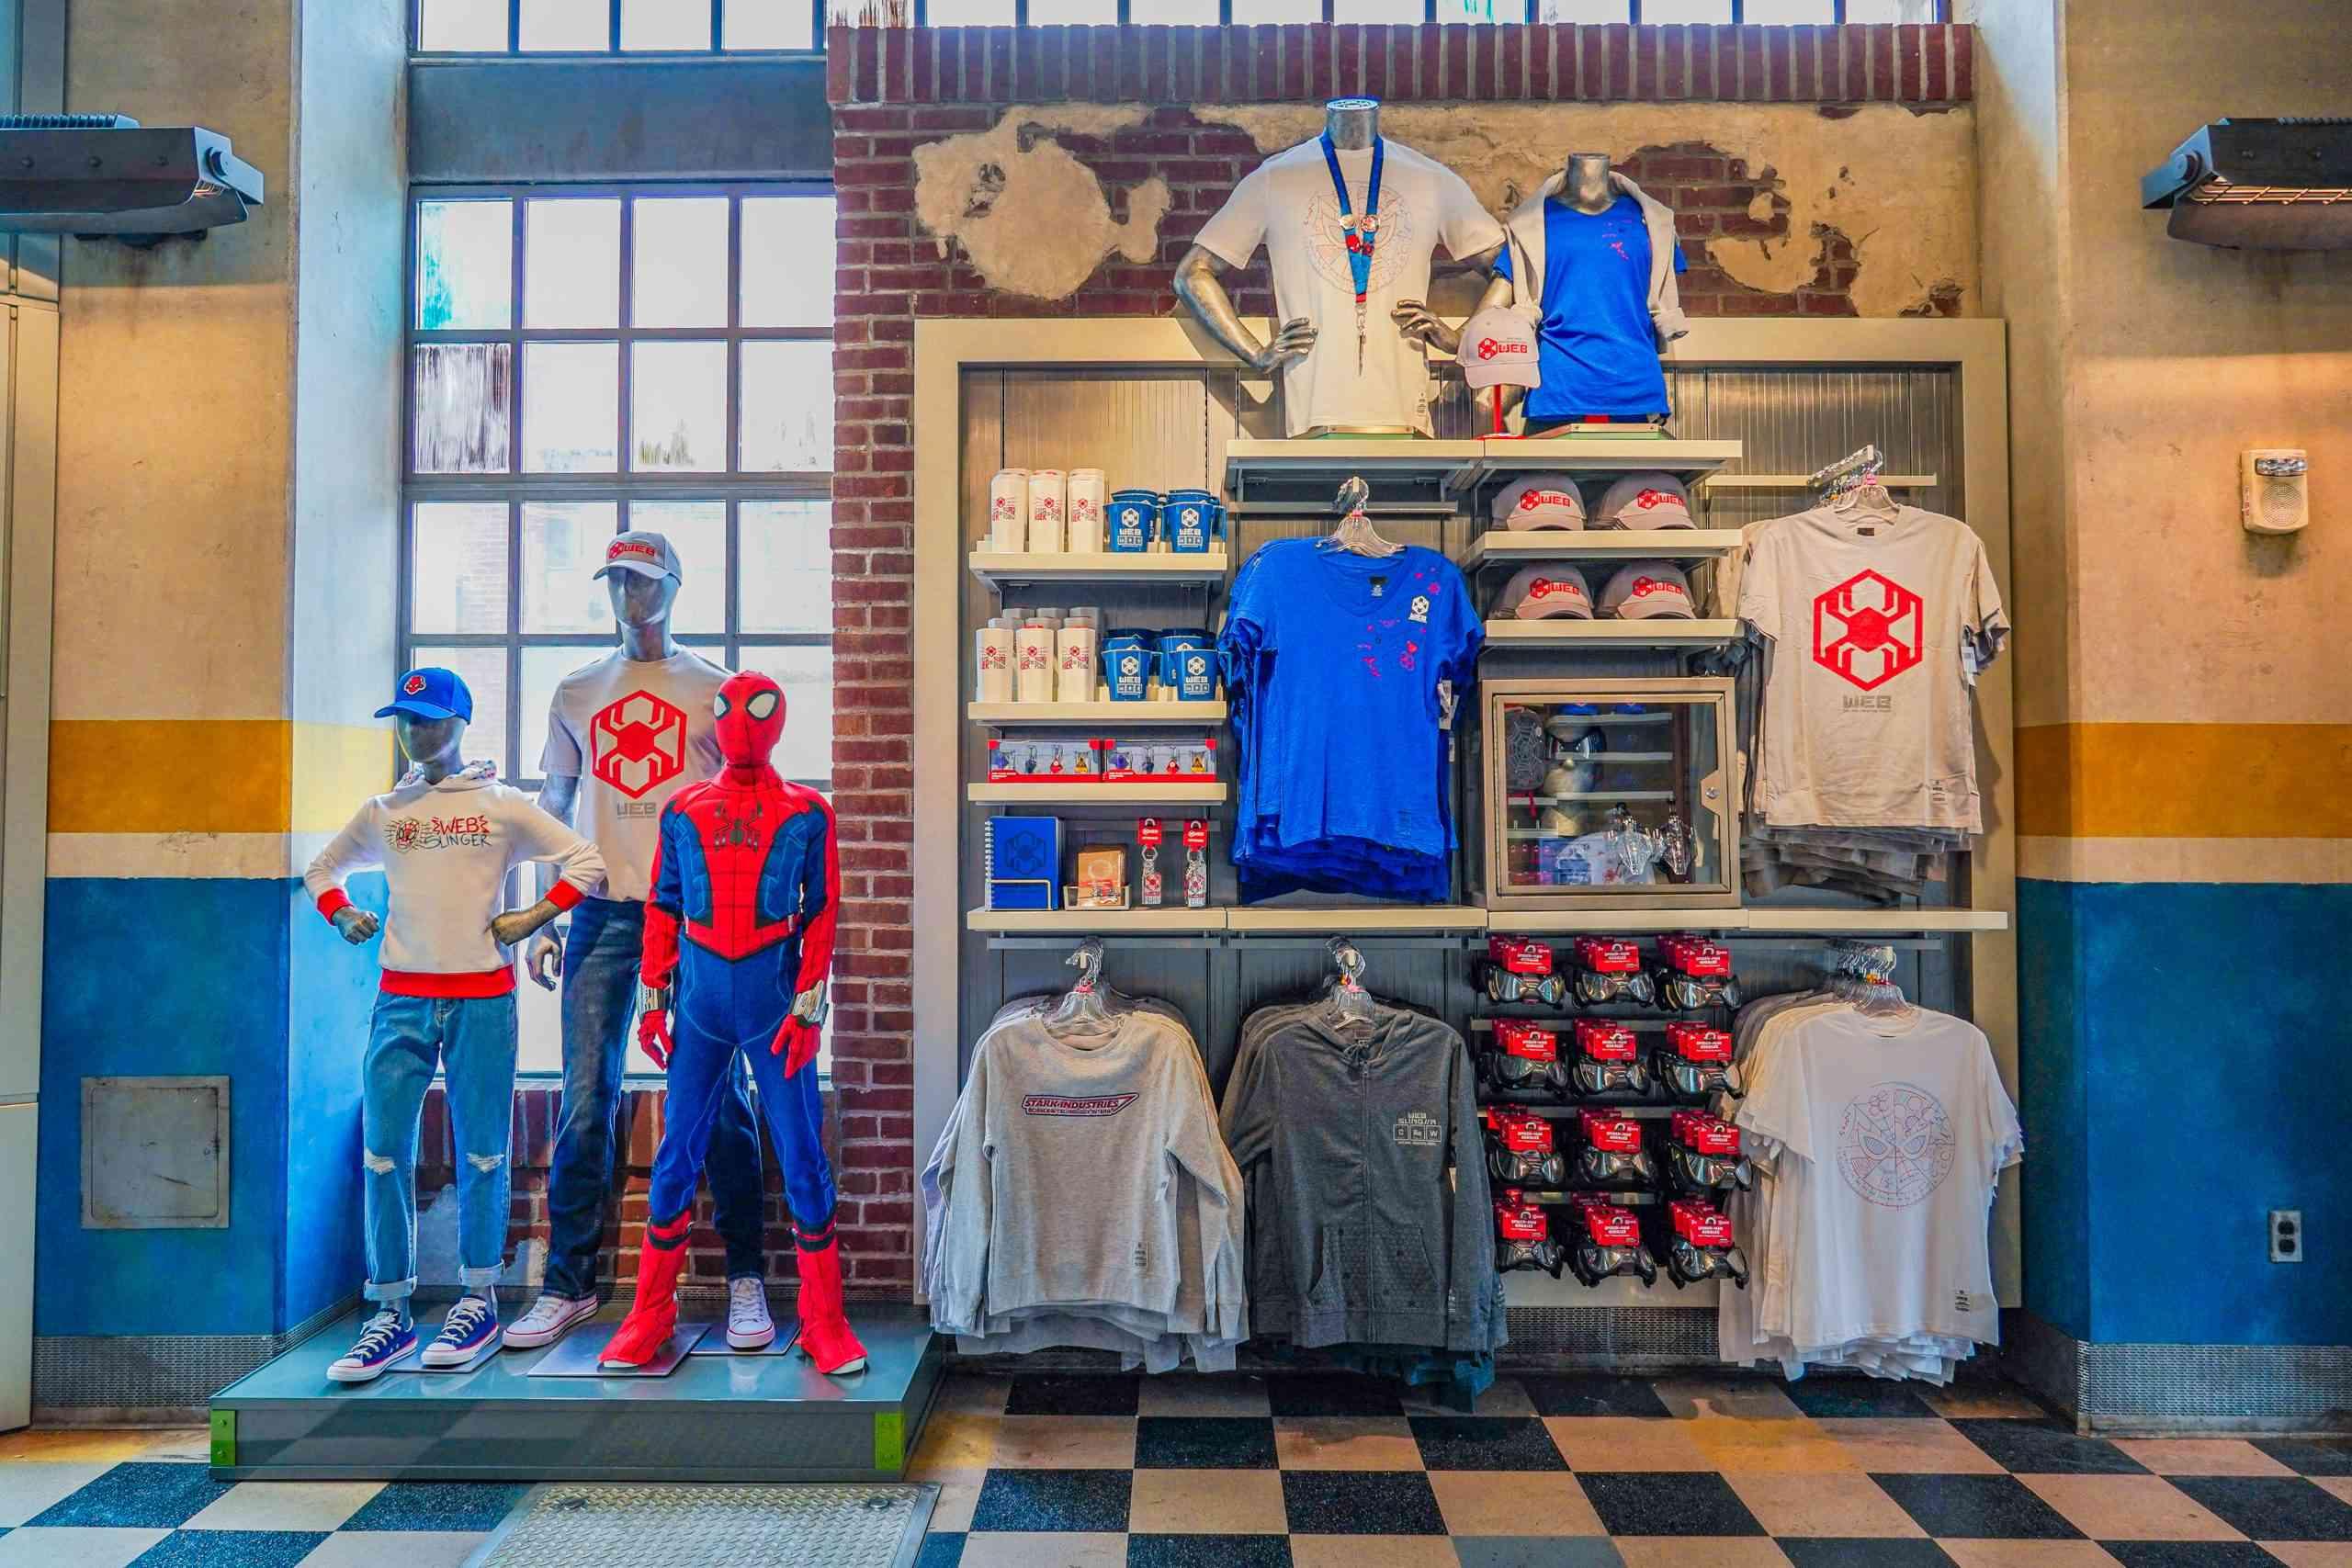 Avengers Campus Merchandise